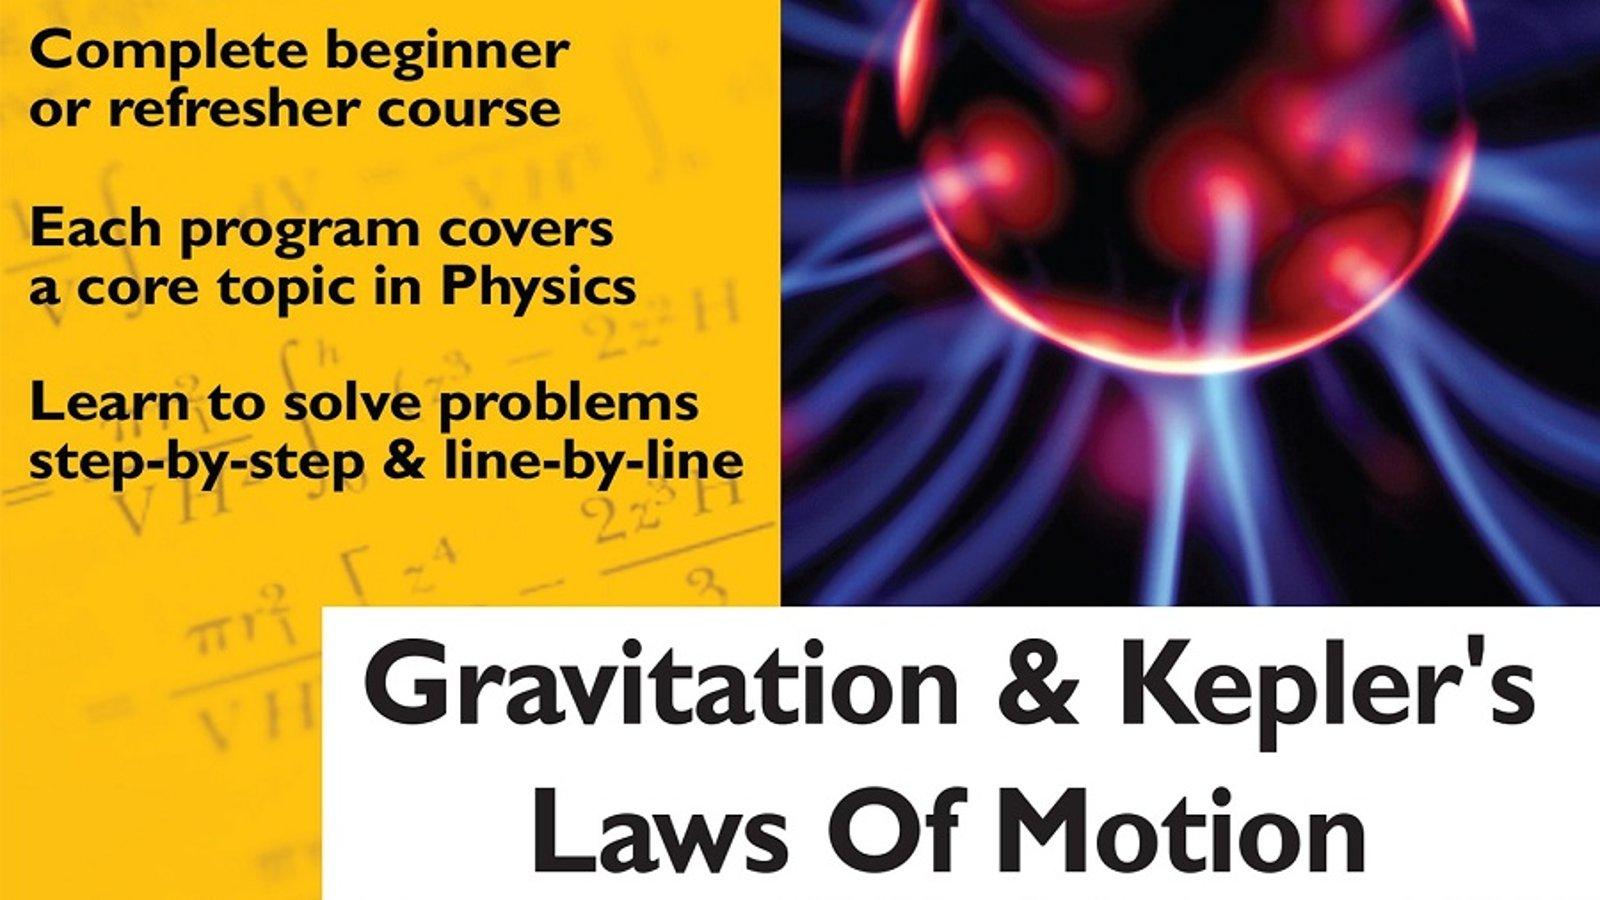 Gravitation and Kepler's Laws Of Motion